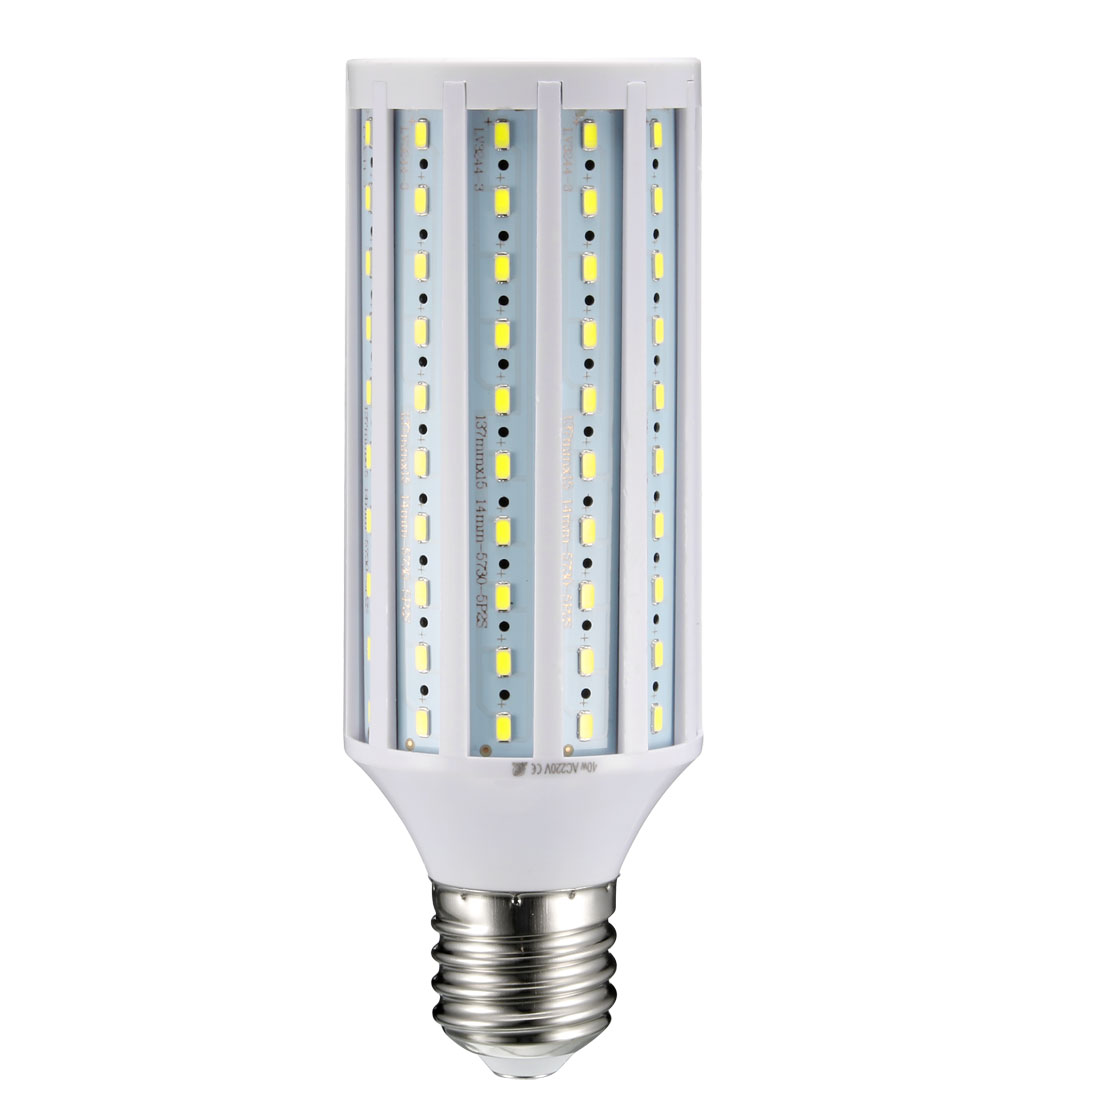 AC 220V 40W E40 Screw Base 150 LEDs SMD 5730 Pure White LED Corn Light Bulb - image 5 de 5